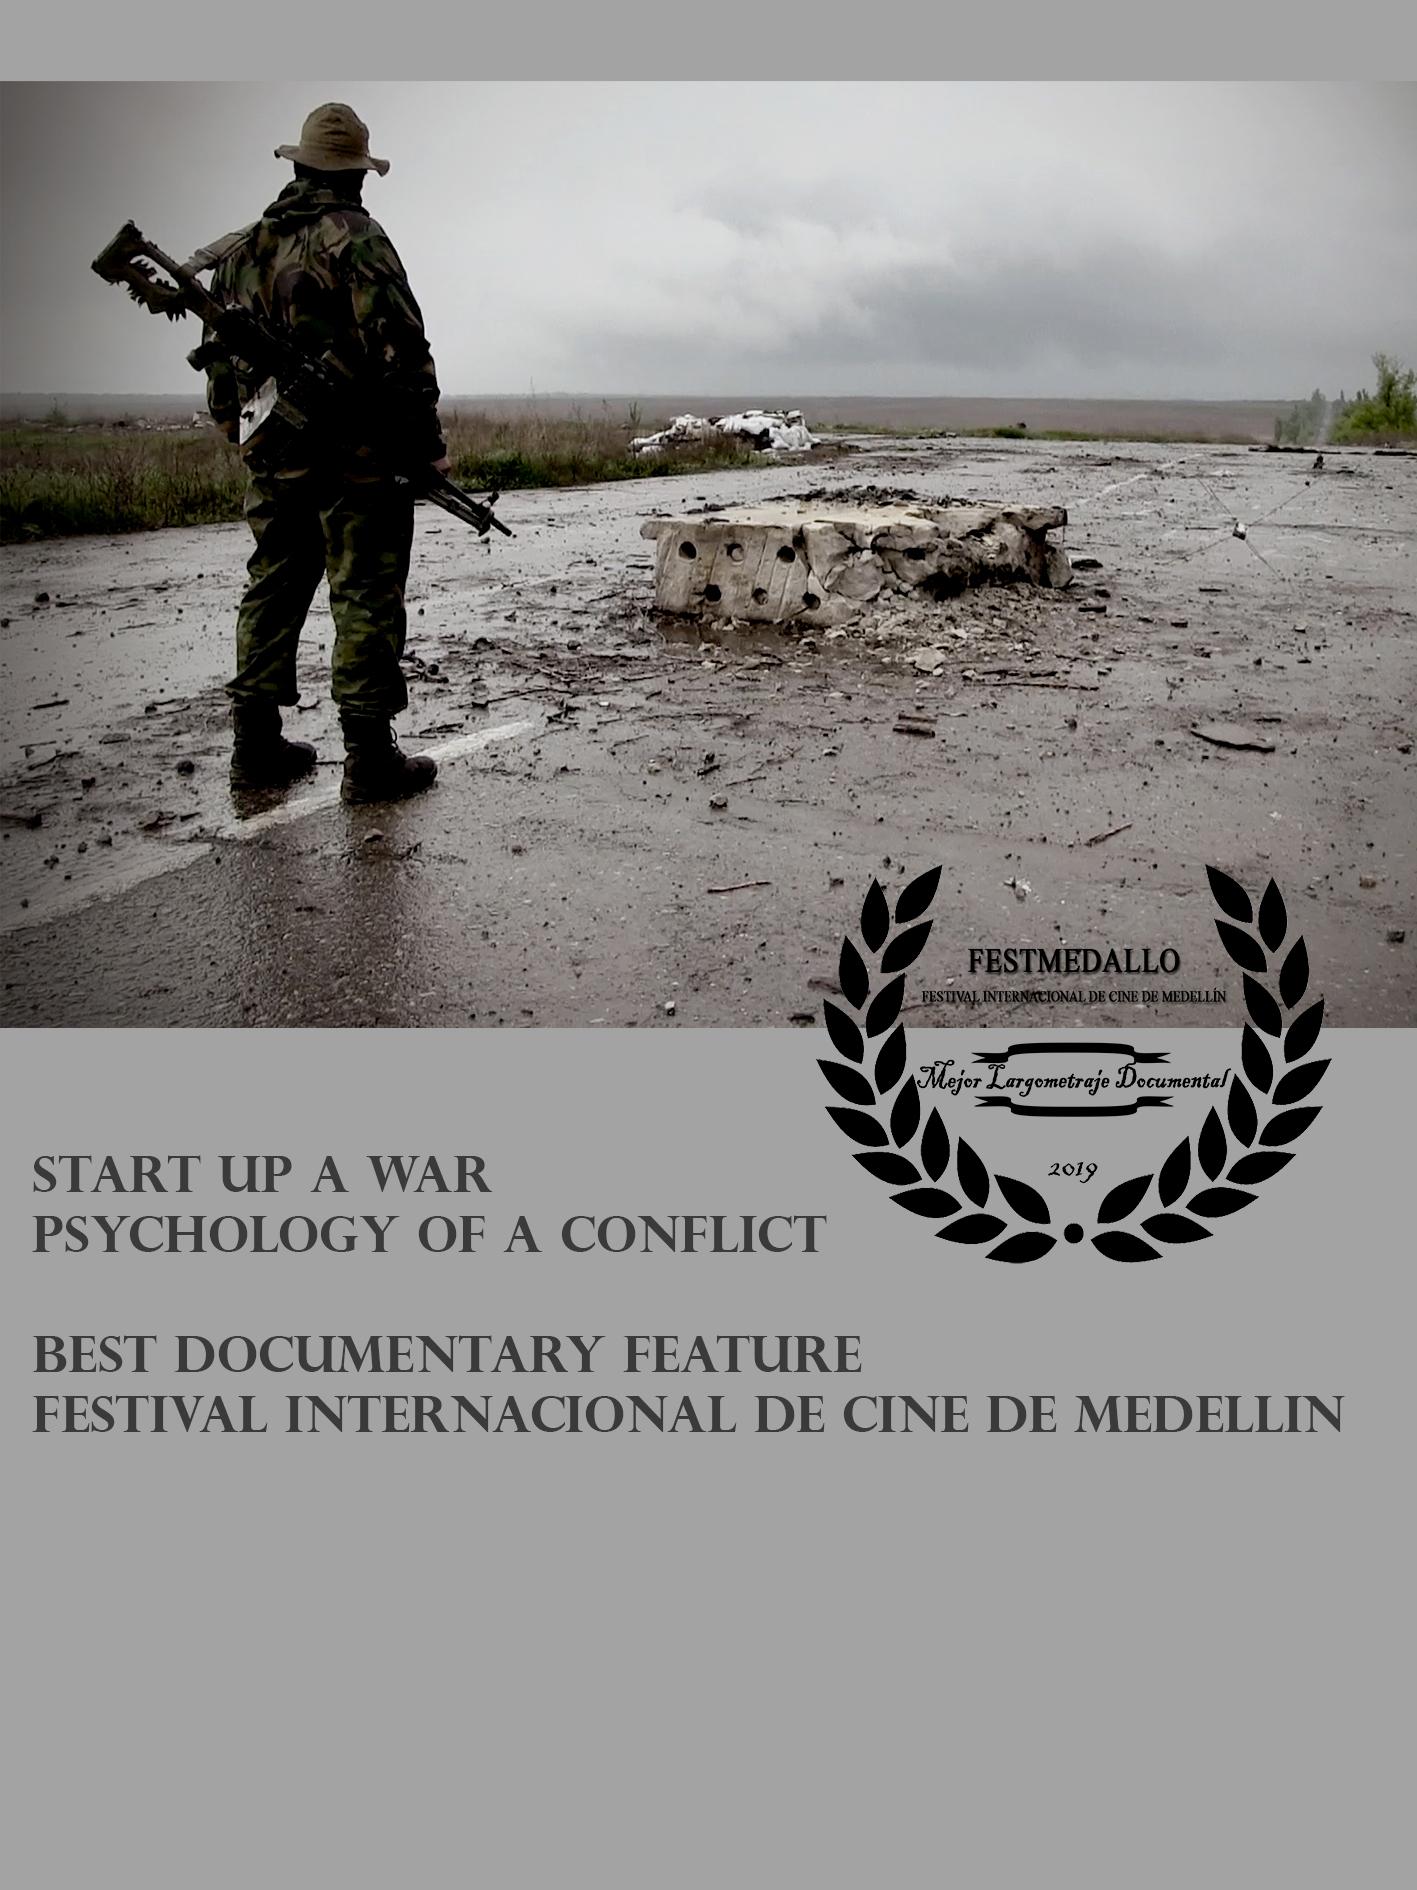 Sara Reginella | Start Up a War Best Documentary Feature Festival Internacional de Cine de Medellin